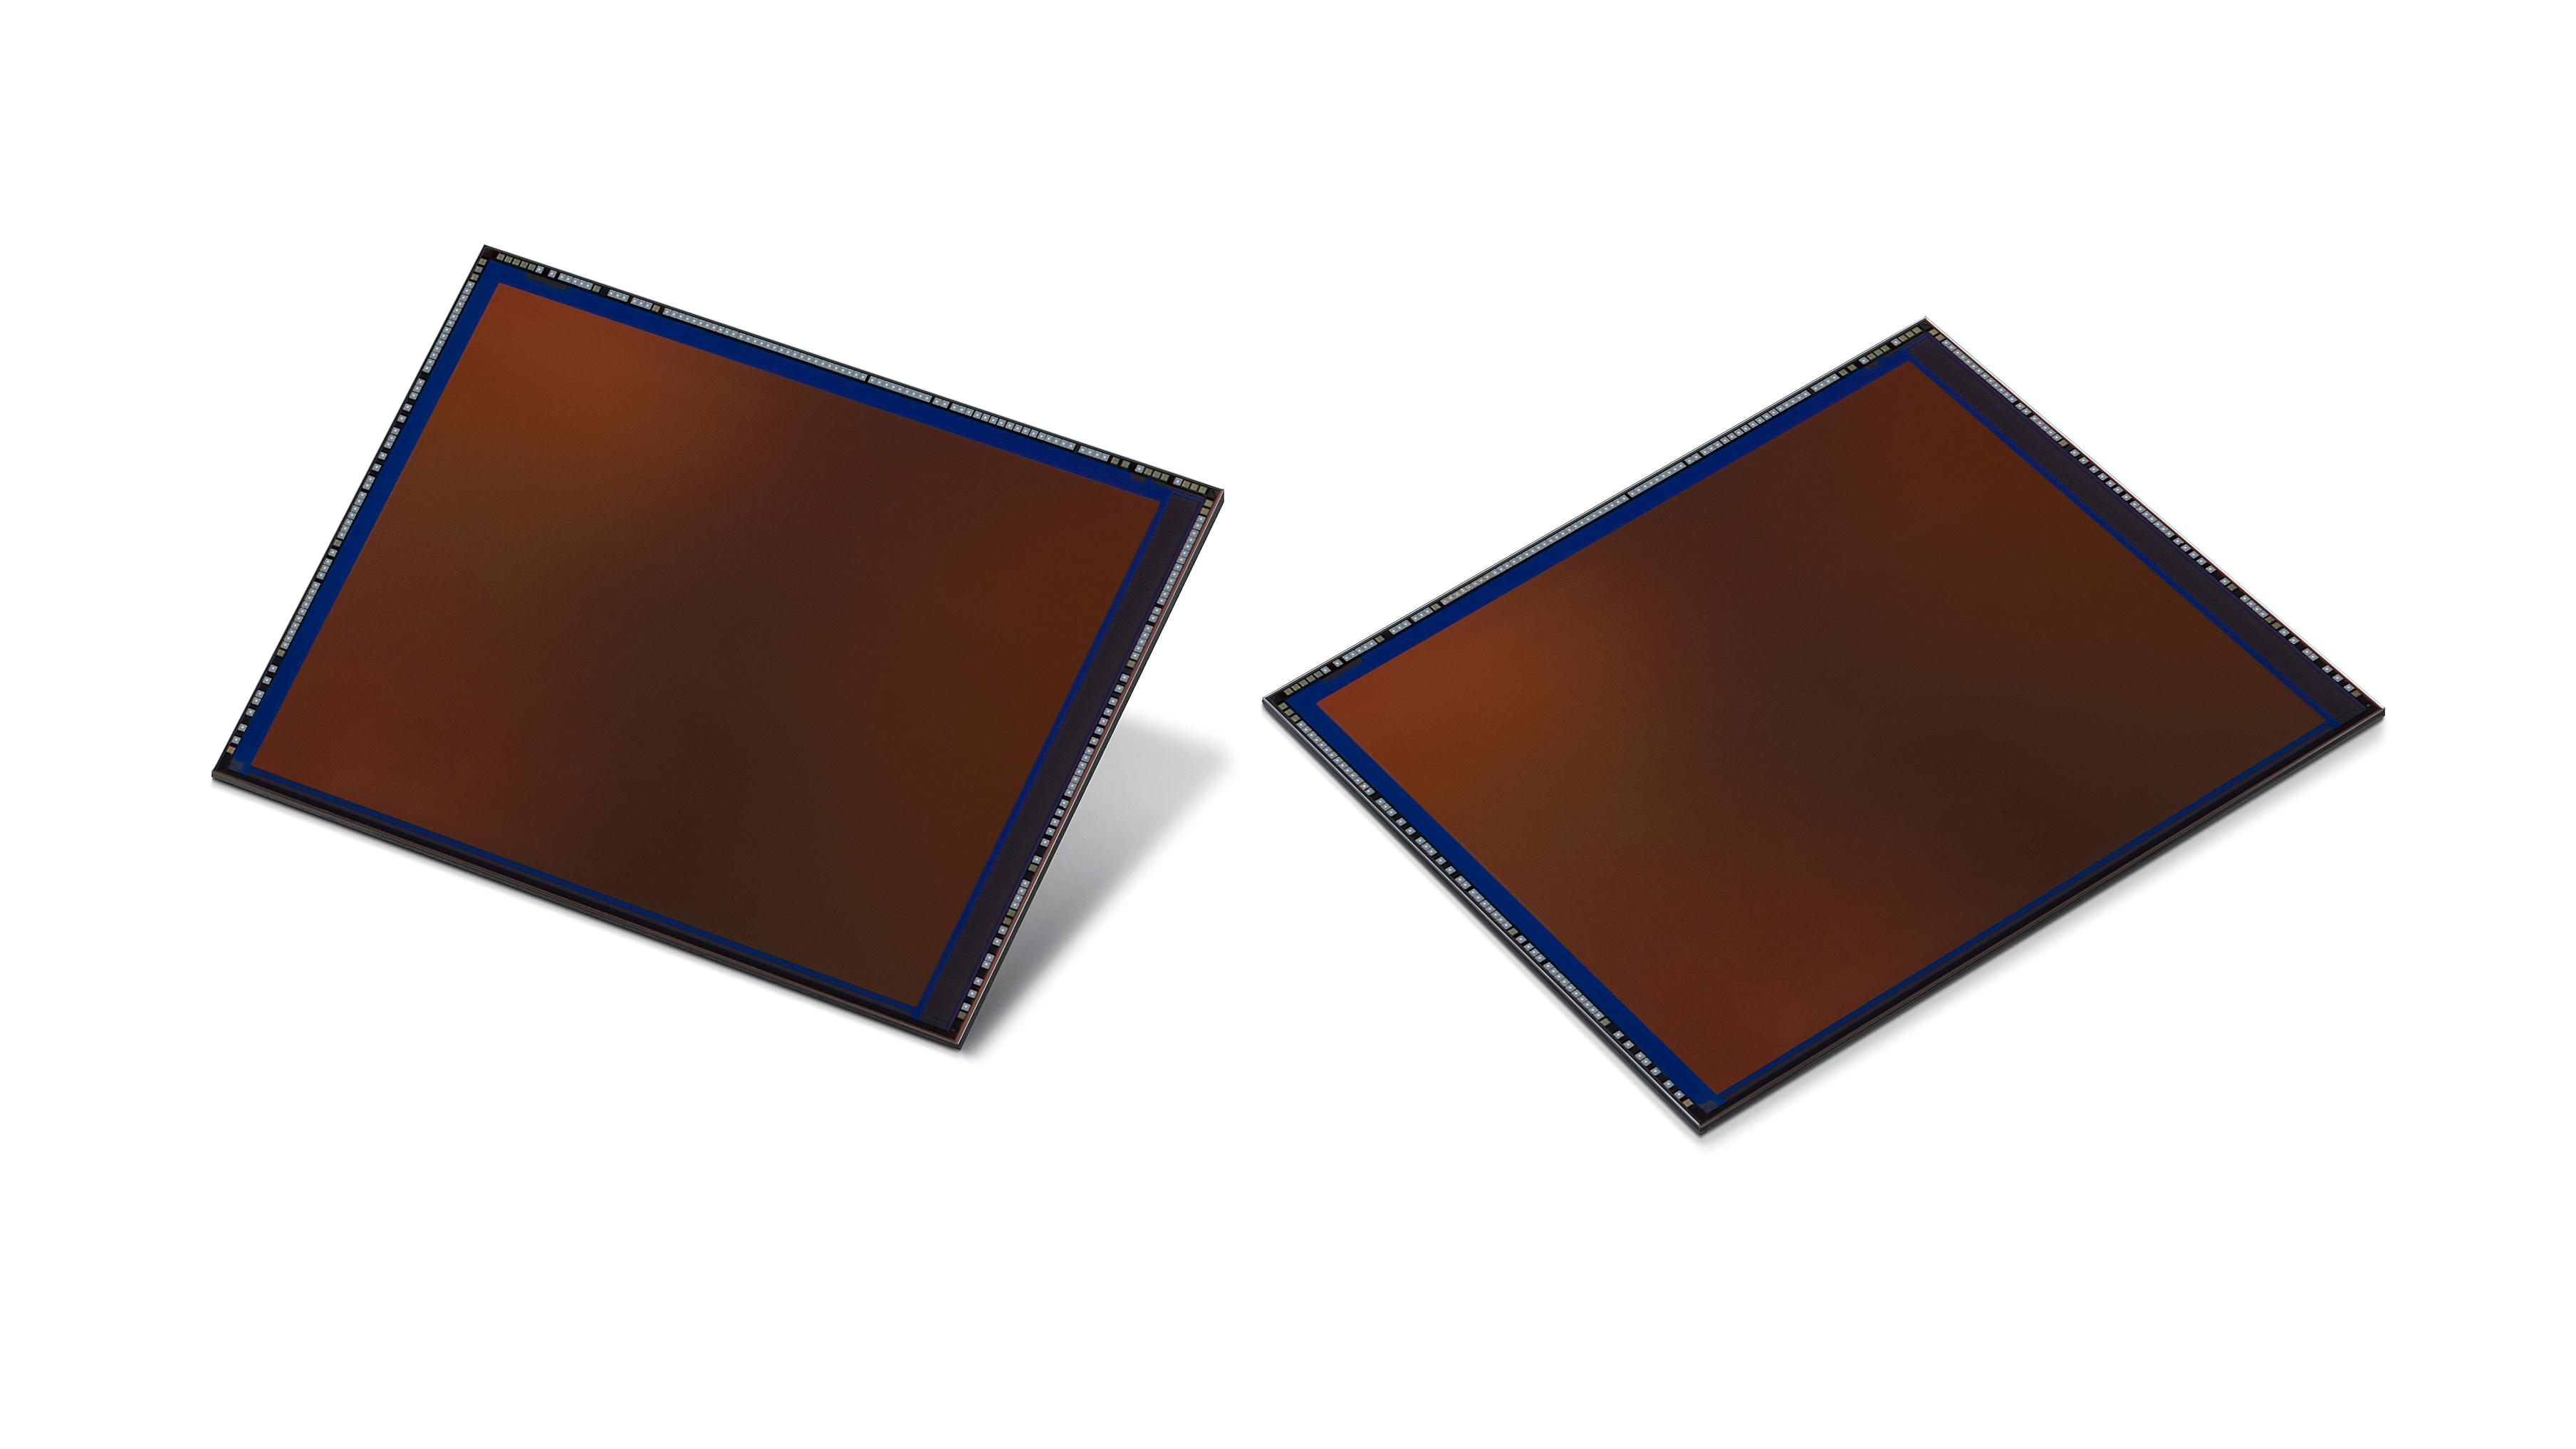 Samsung og Xiaomi slipper mobilkamerasensor på 108 megapiksler